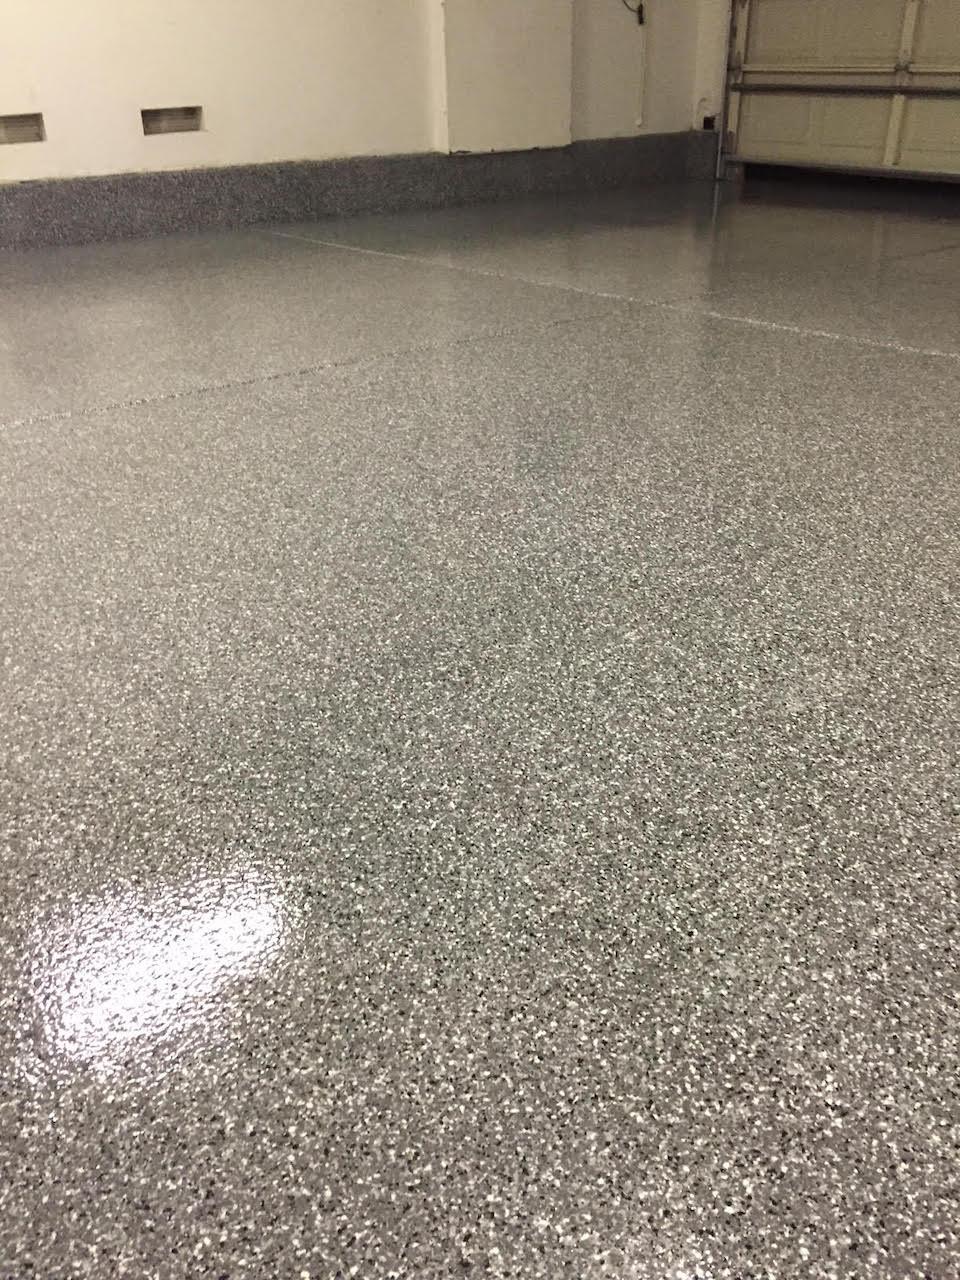 Concrete Garage Floors And Epoxy Coatings Transform Your